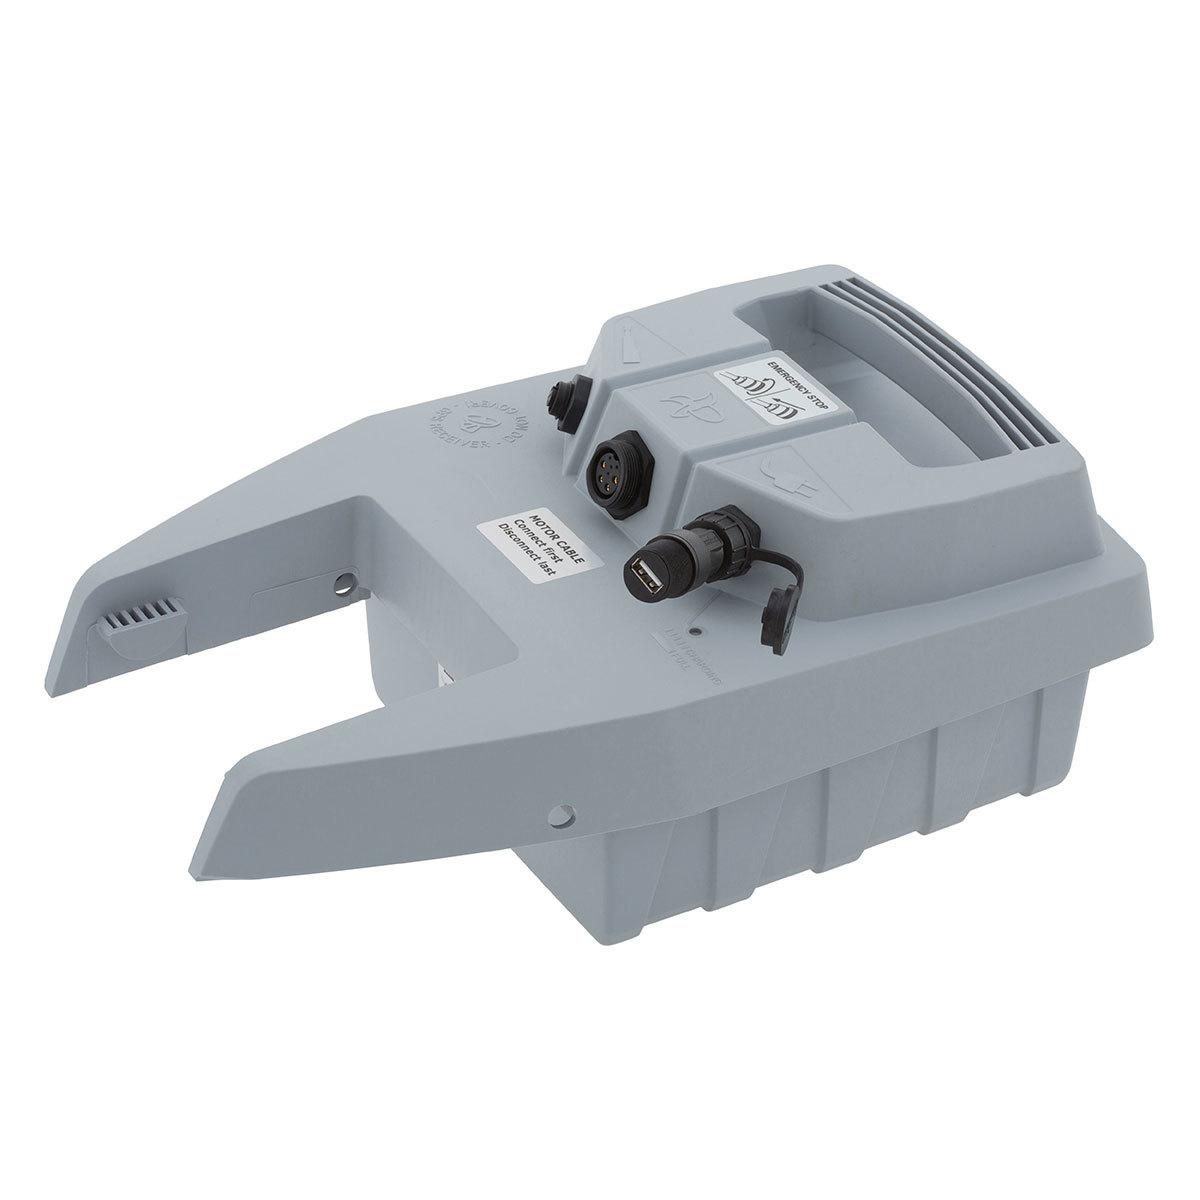 Battery 915 for Torqeedo Travel 503/1003/1103